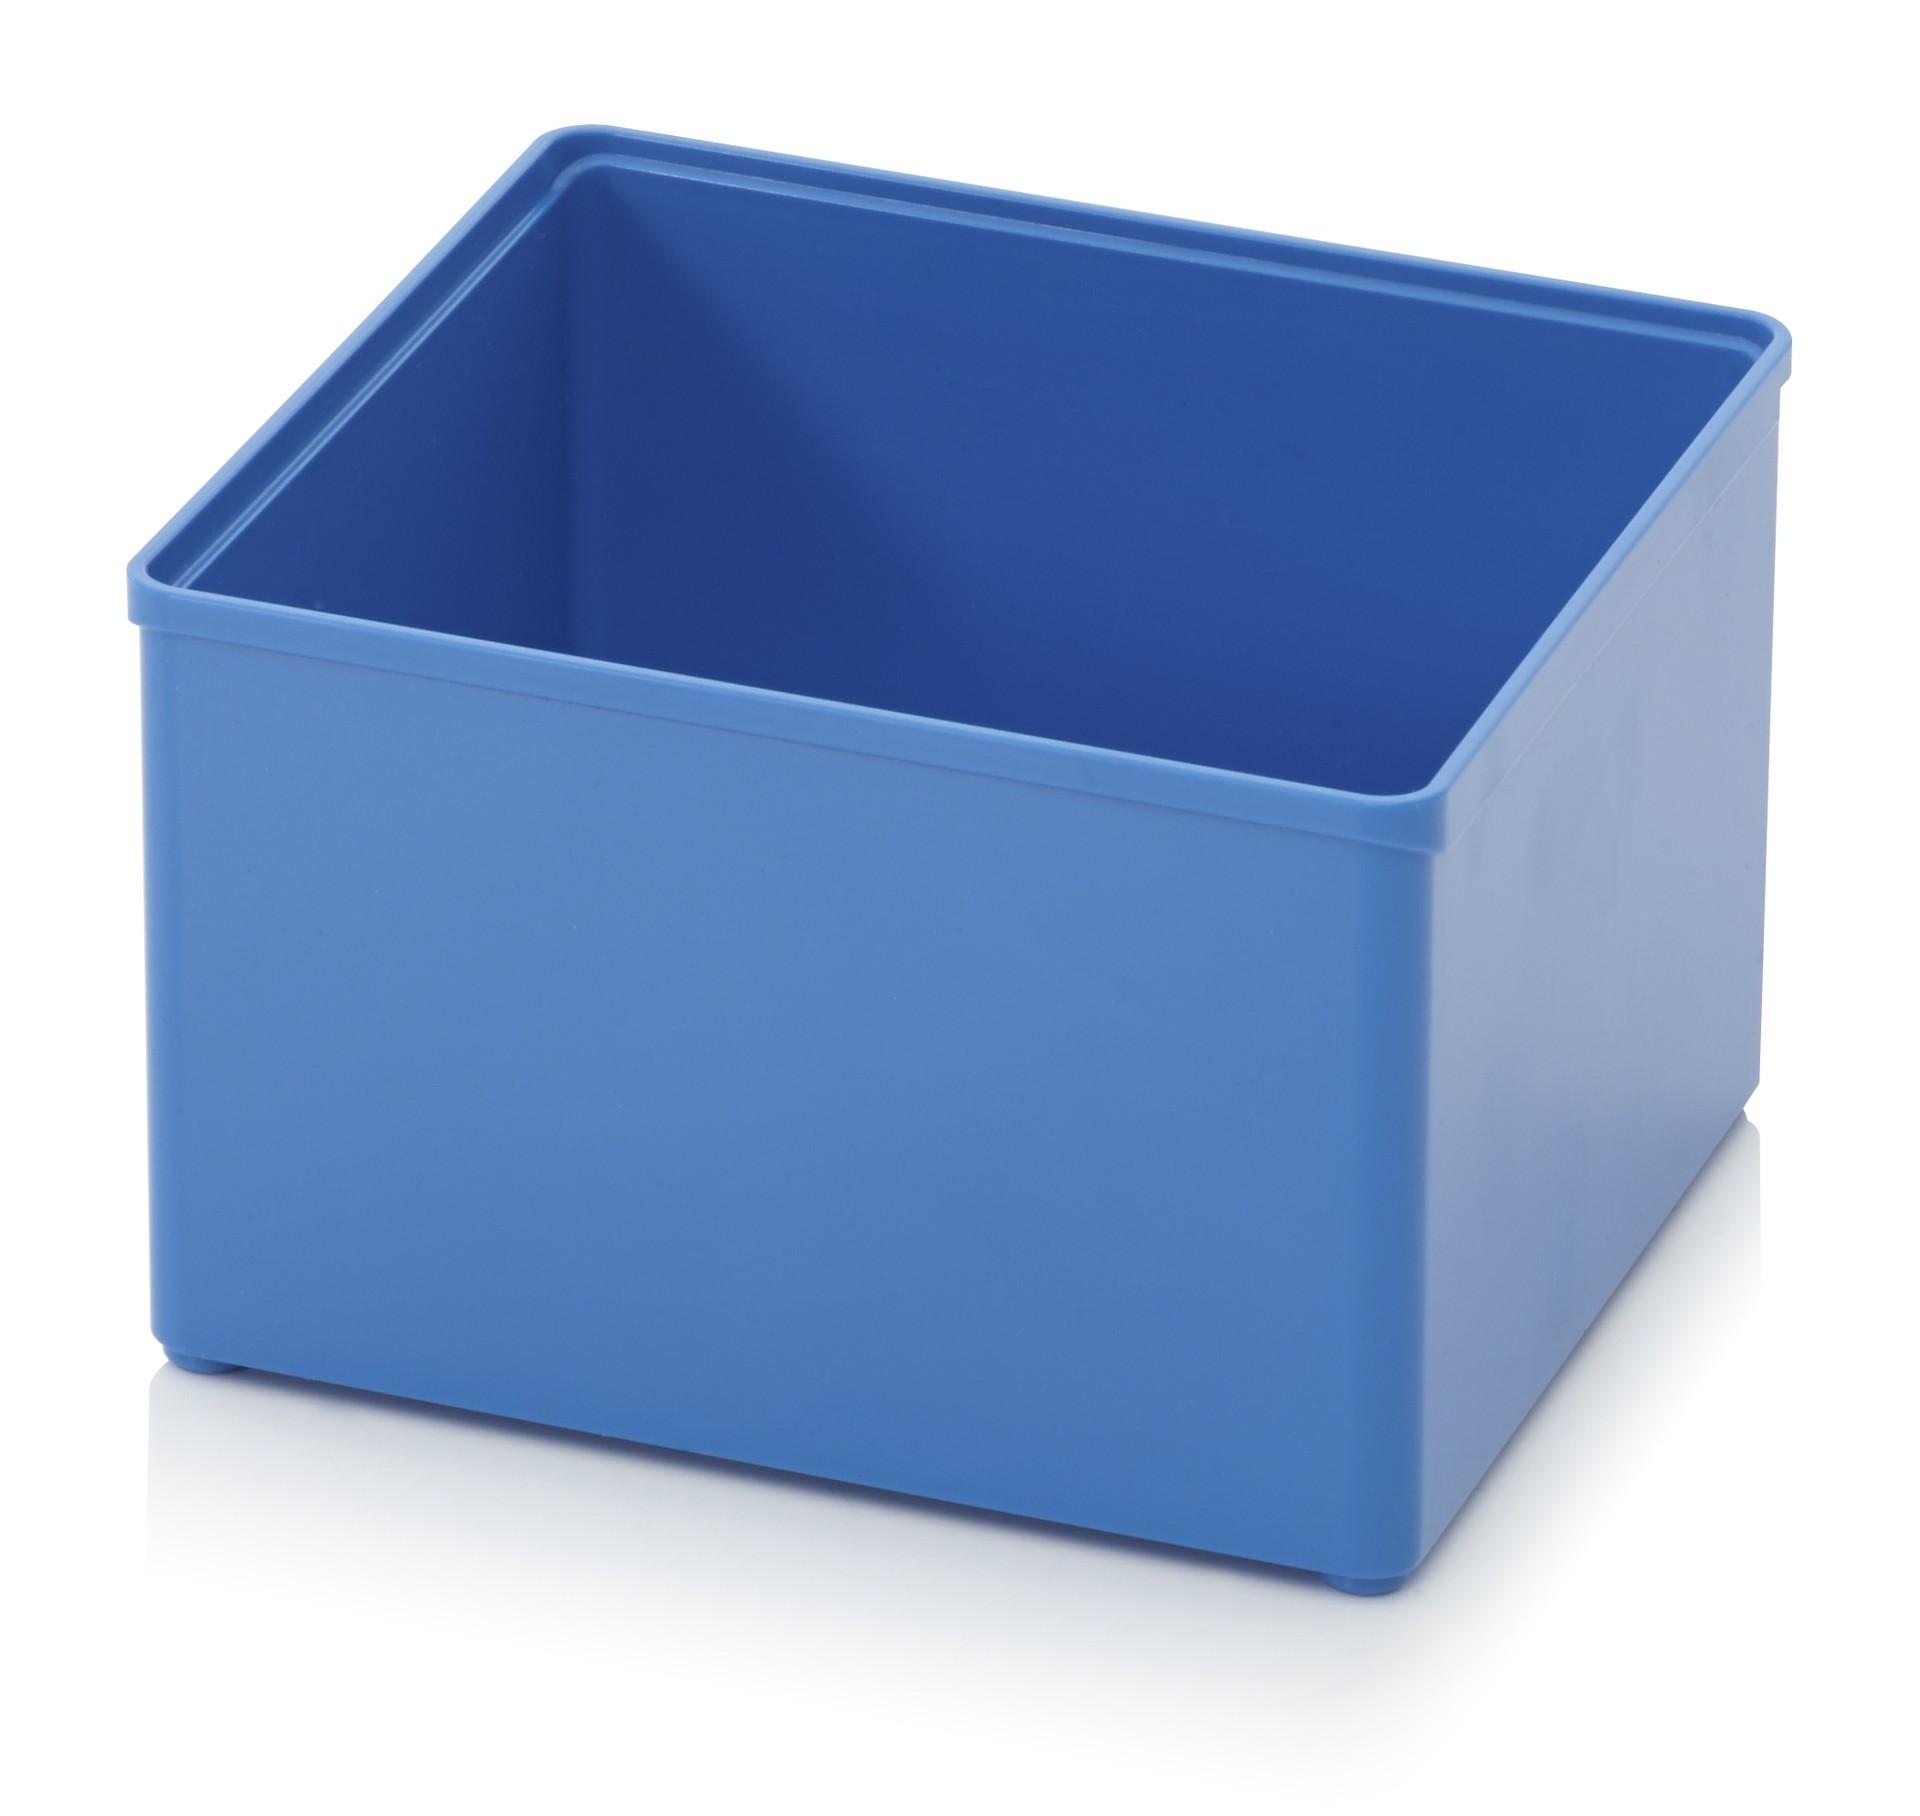 Toolbox 2 x 2 Behälter